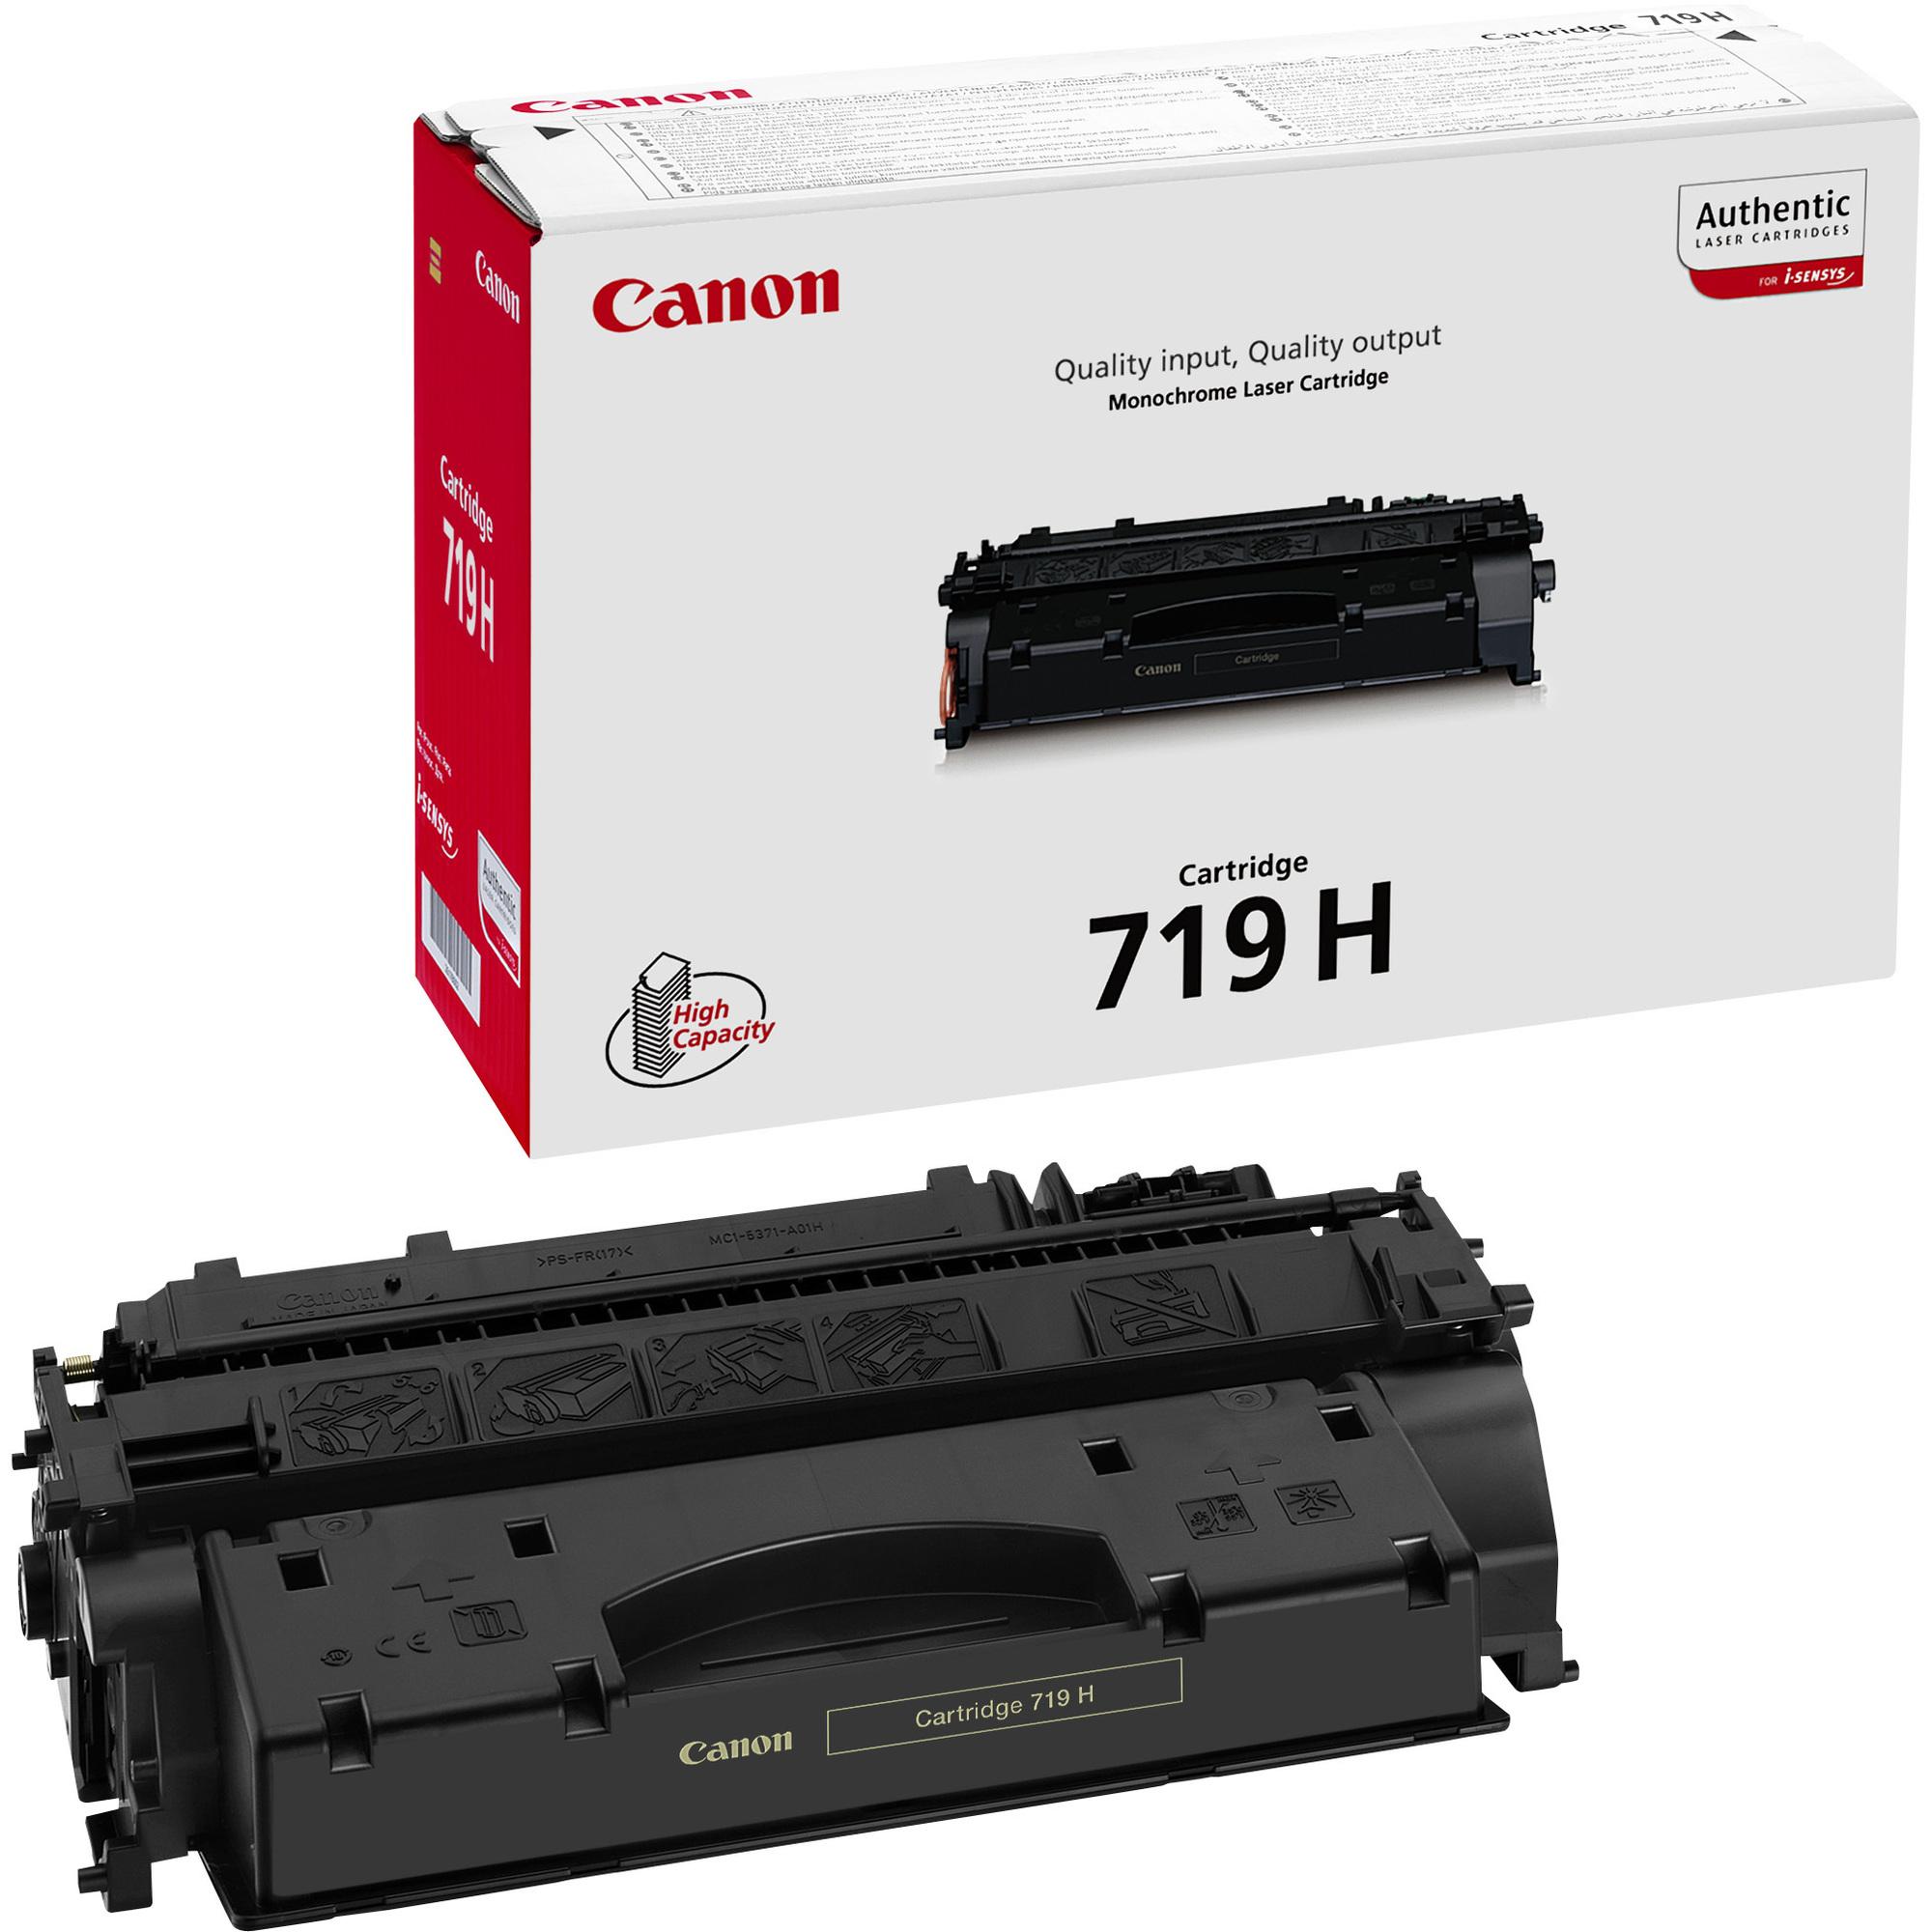 Canon 719H Toner Cartridge - Black